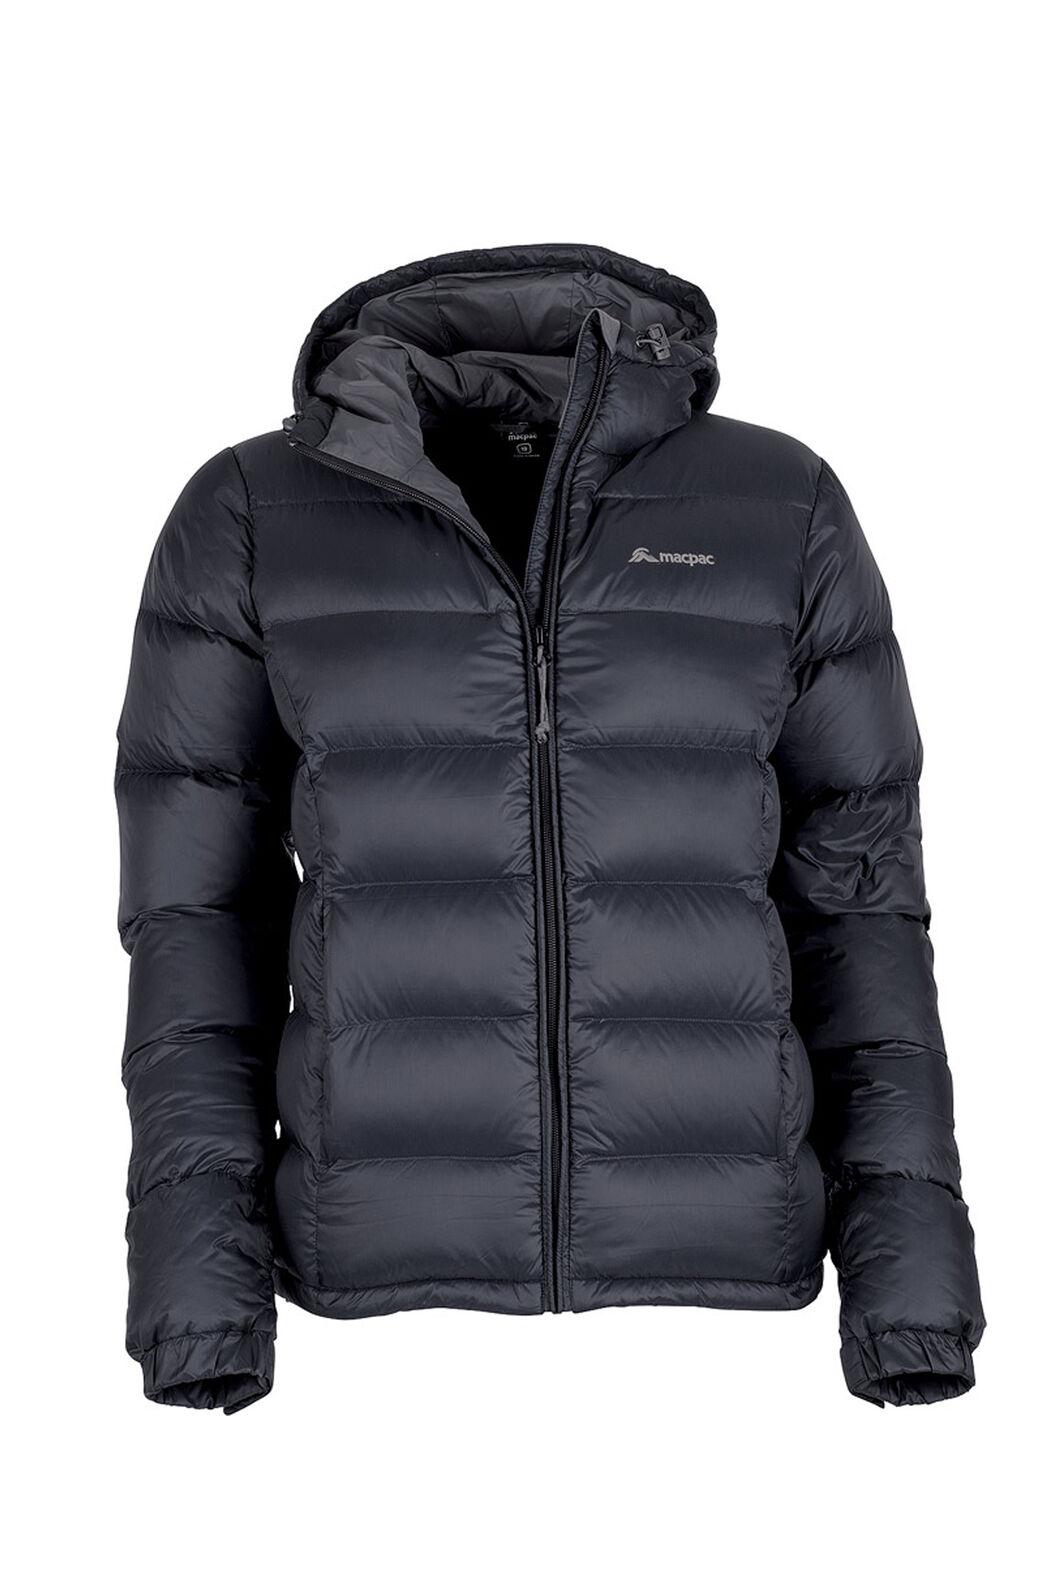 Macpac Halo Hooded Down Jacket — Women's, Black, hi-res